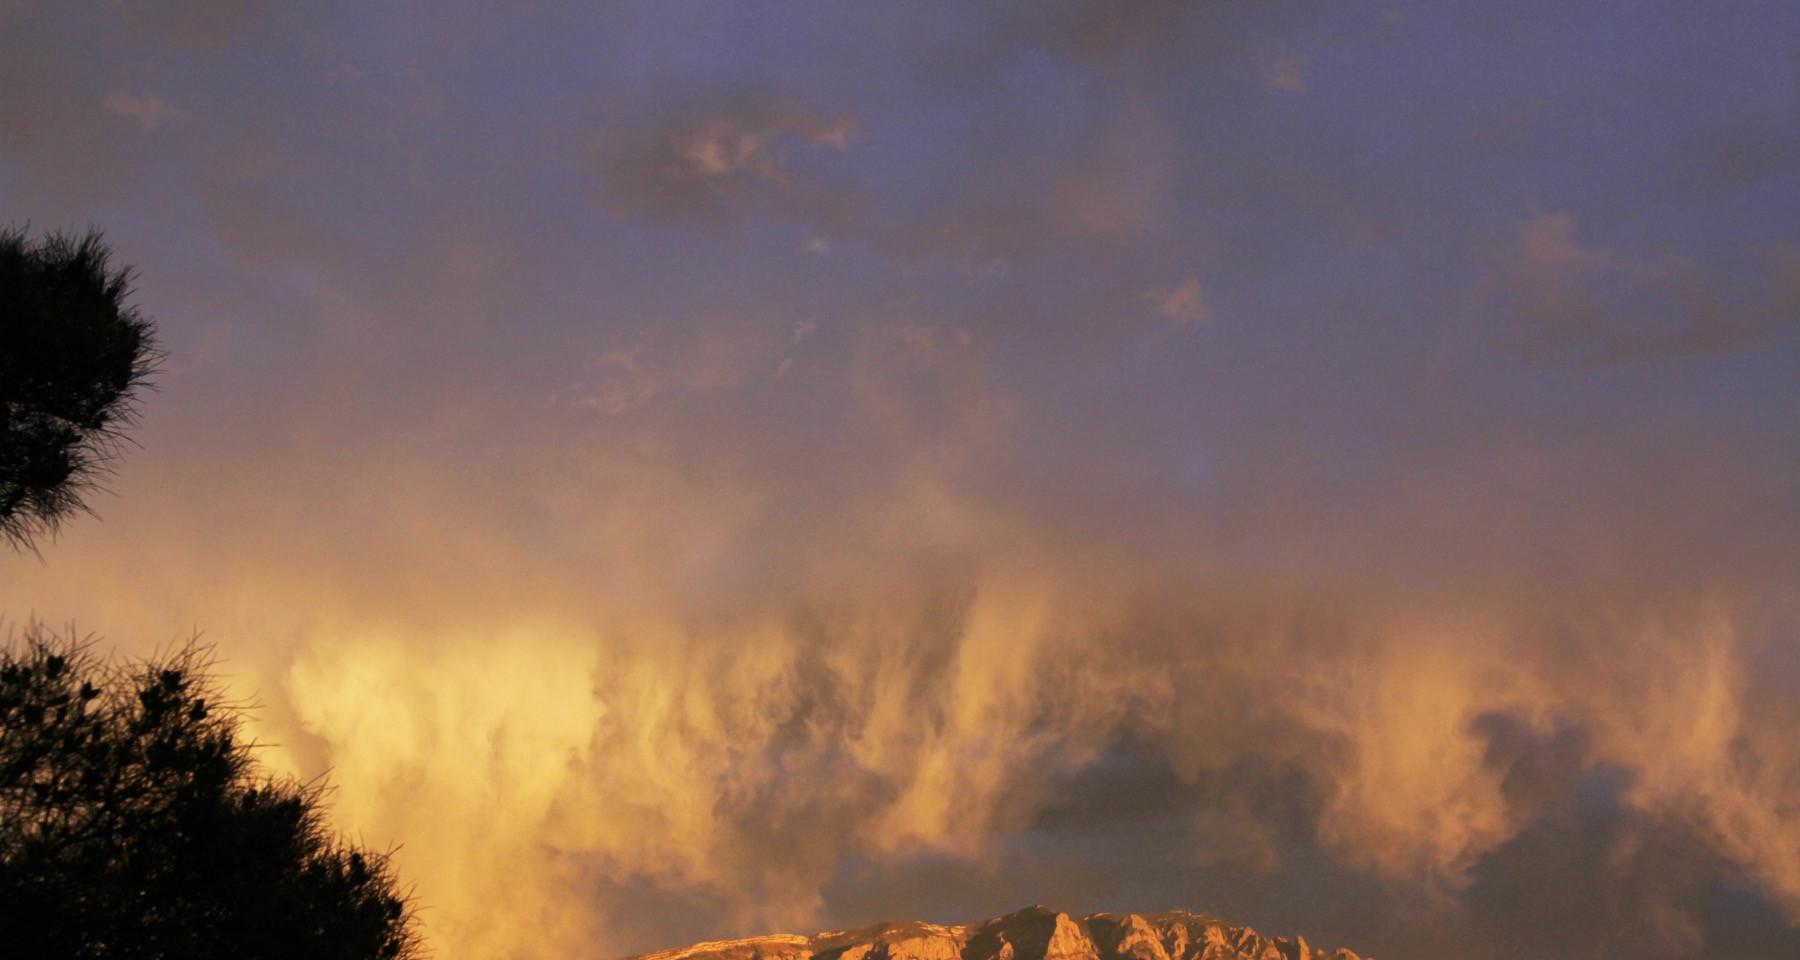 Sun Caleideoscope at Sunset